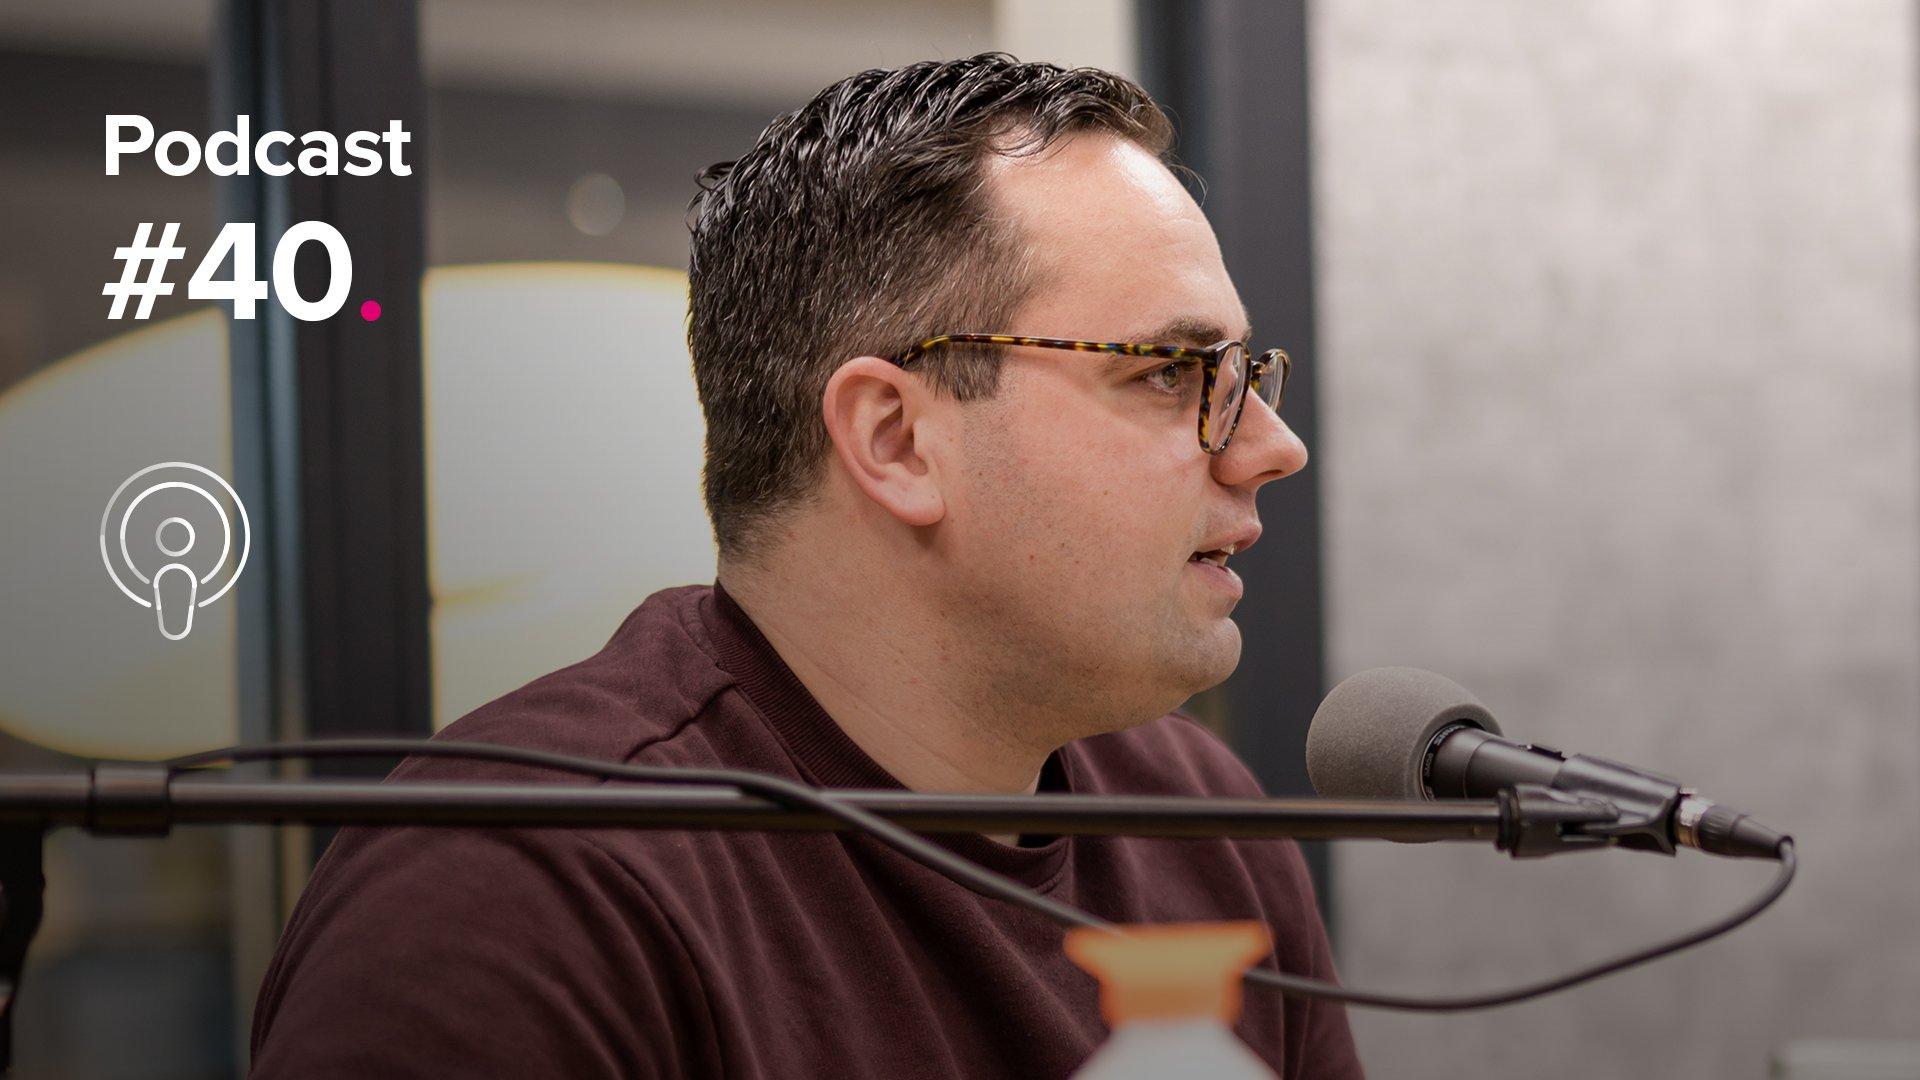 Podcast Digital Brains #40